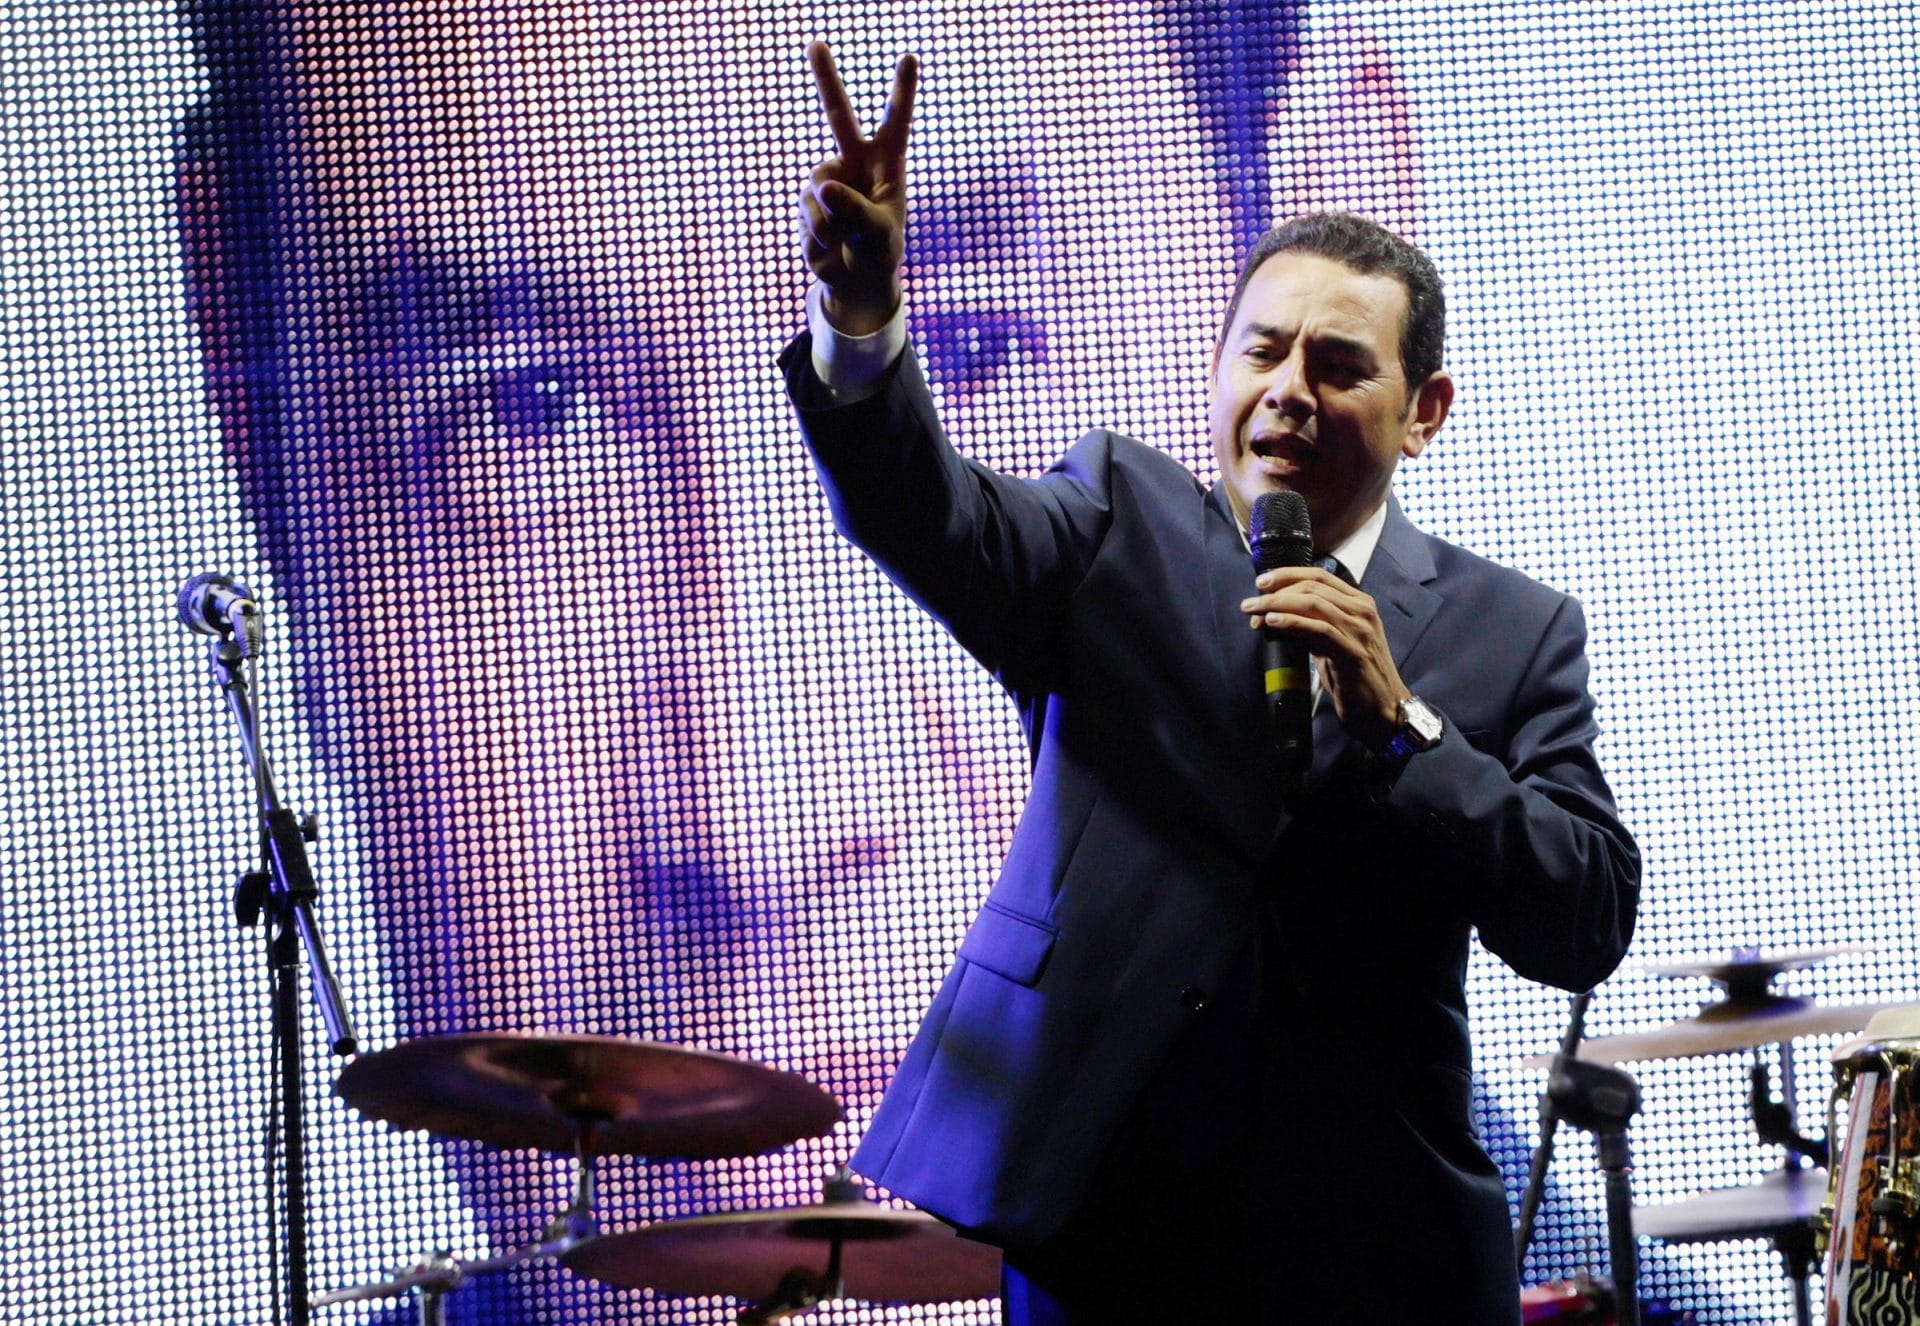 Jimmy Morales o el outsider del poder guatemalteco